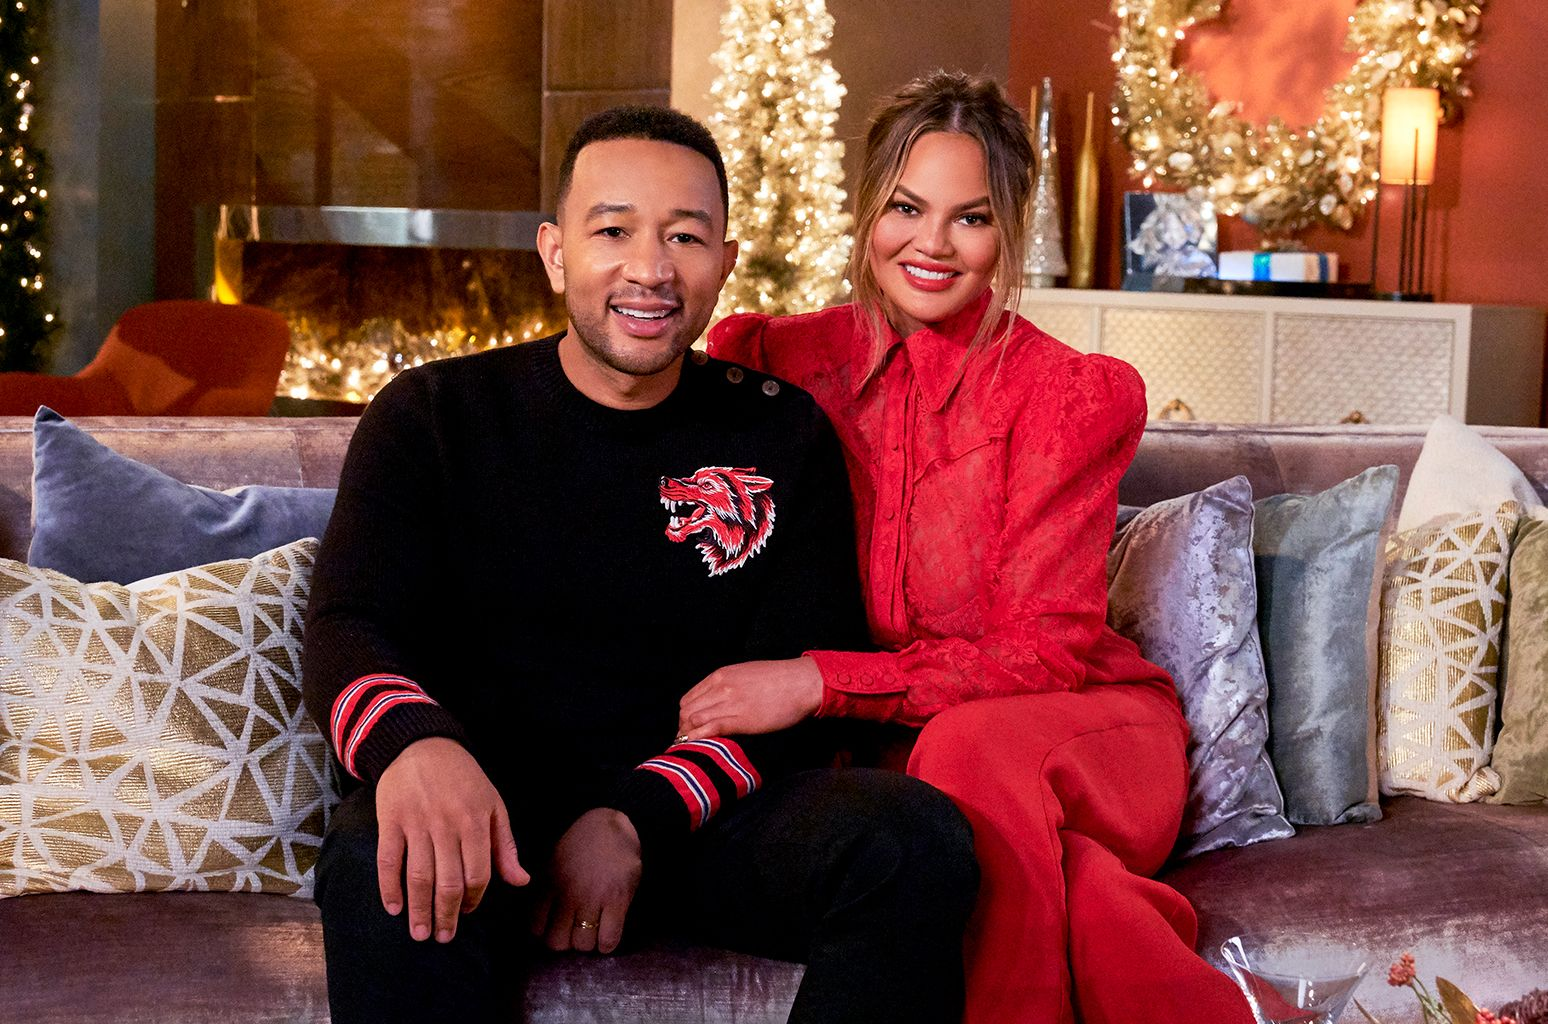 John Legend & Chrissy Teigen's 'A Legendary Christmas